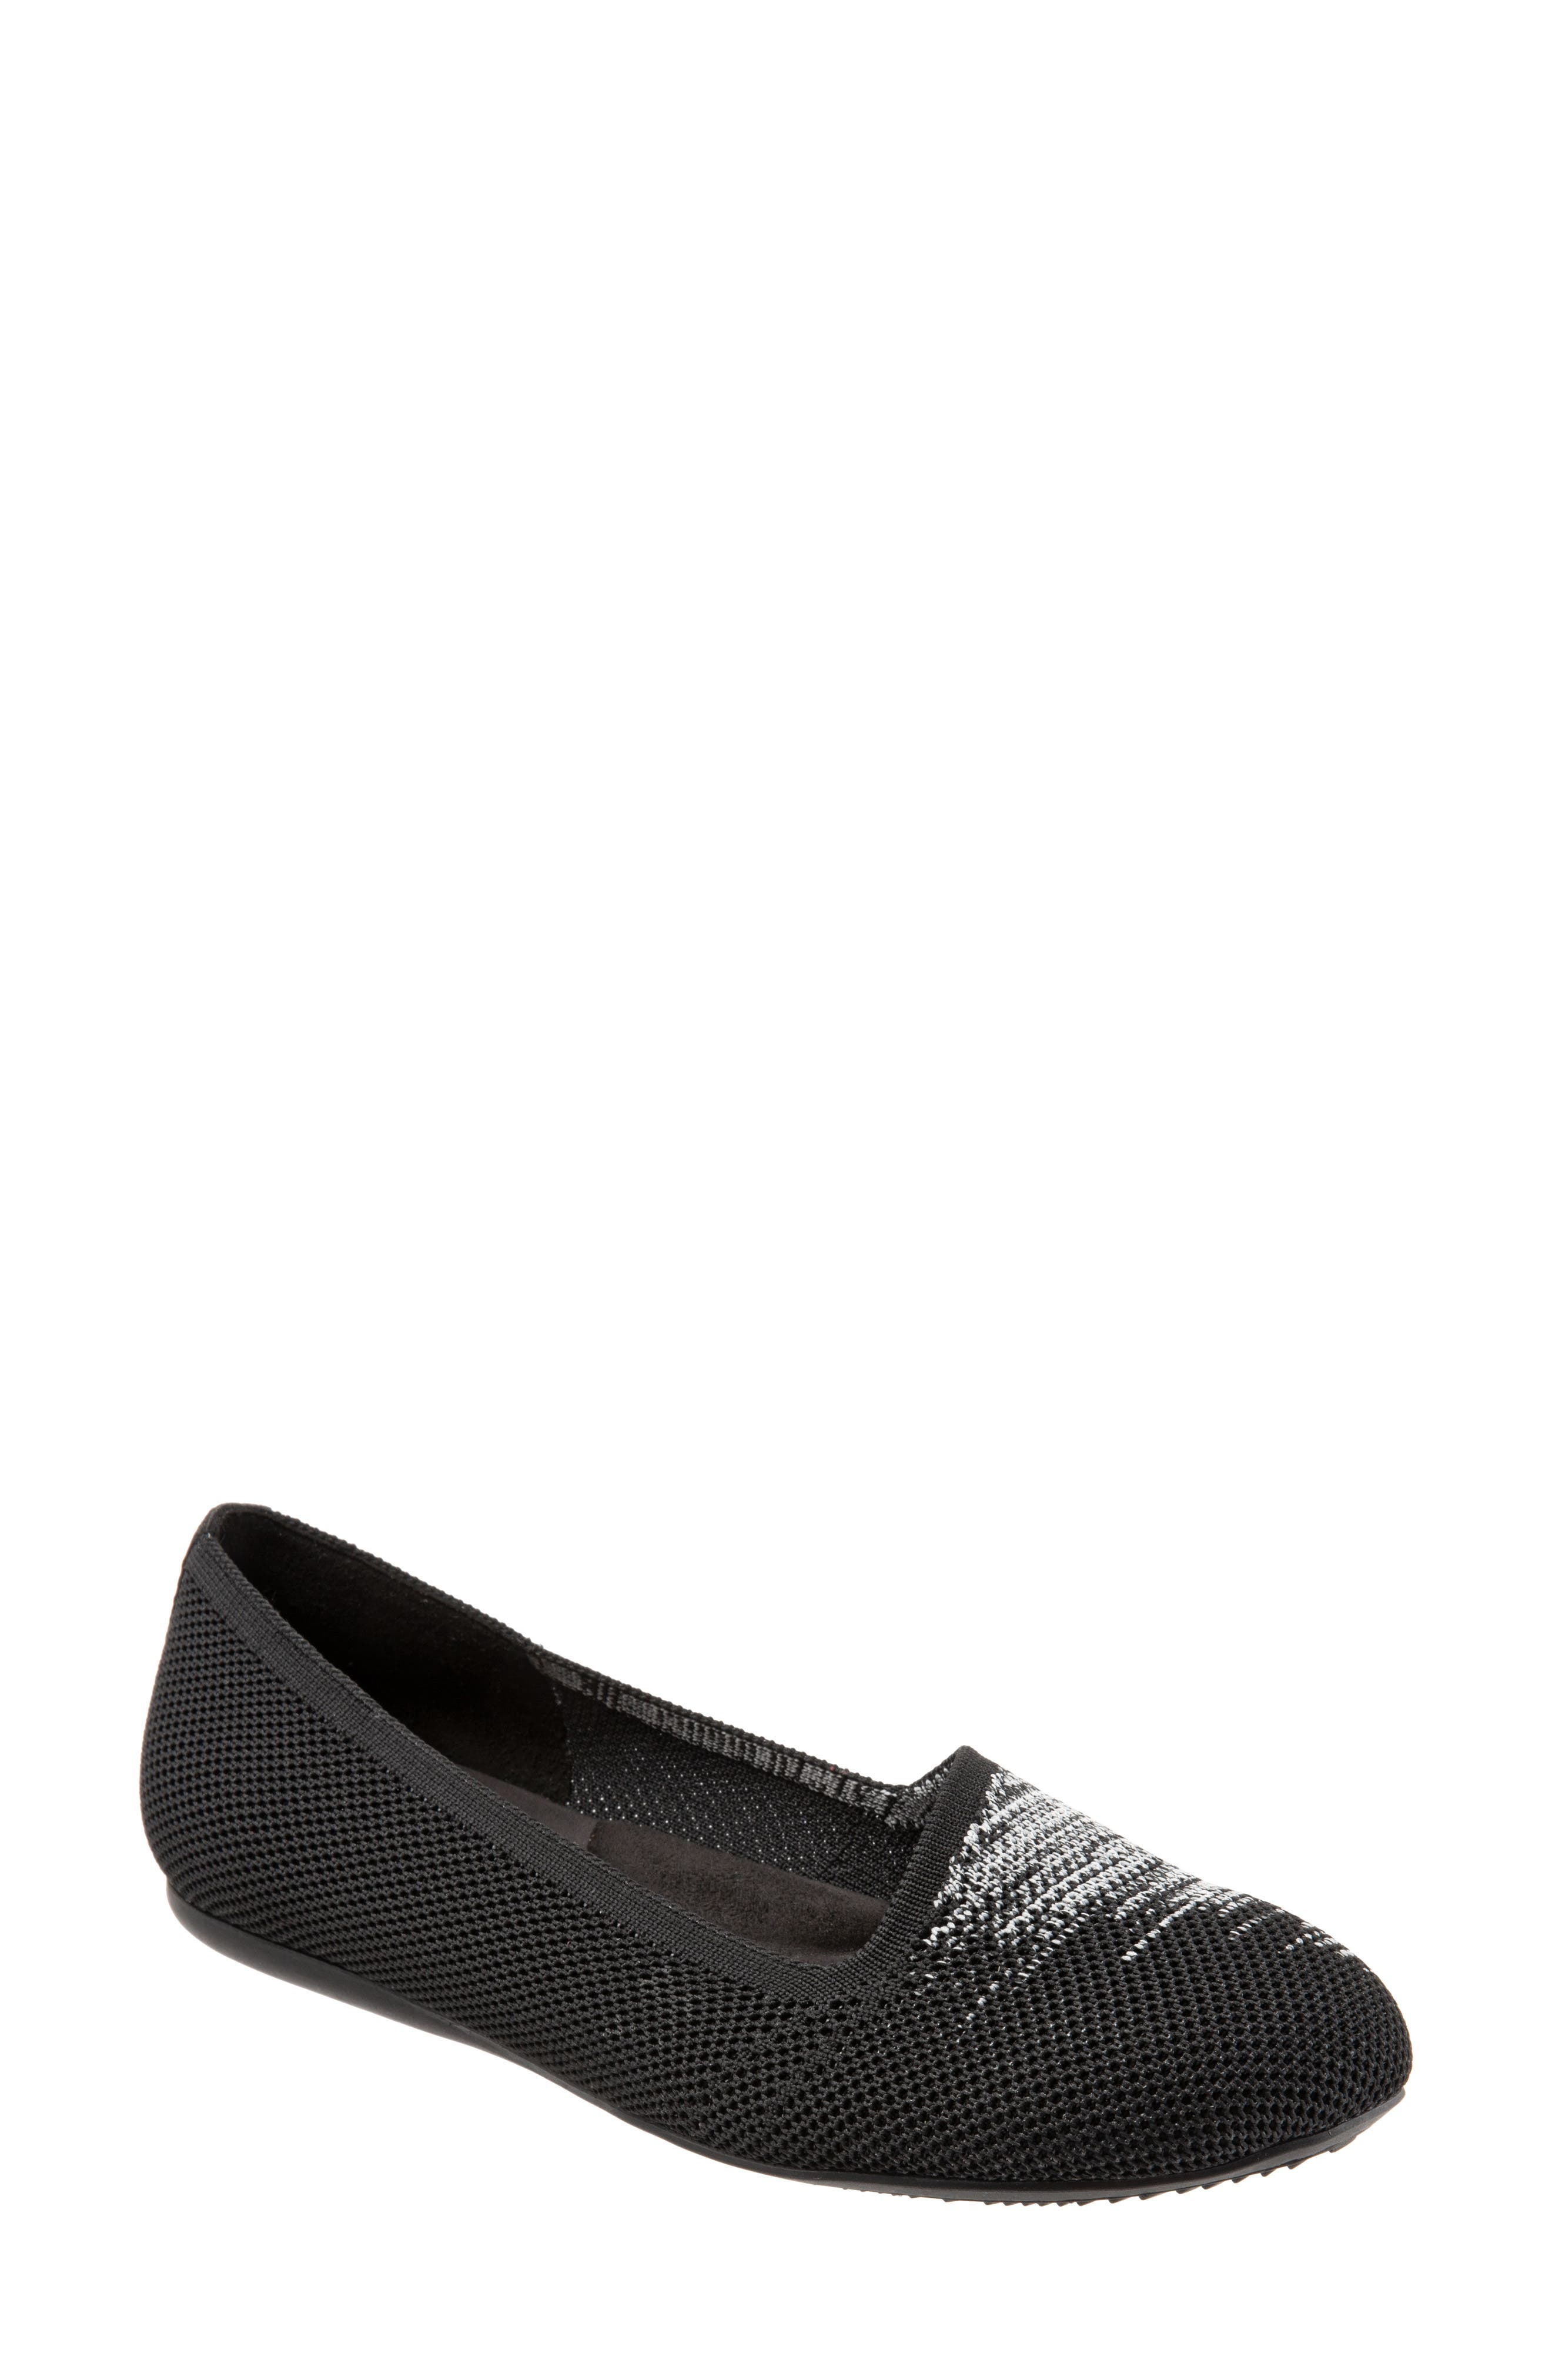 Softwalk Sicily Knit Flat N - Black